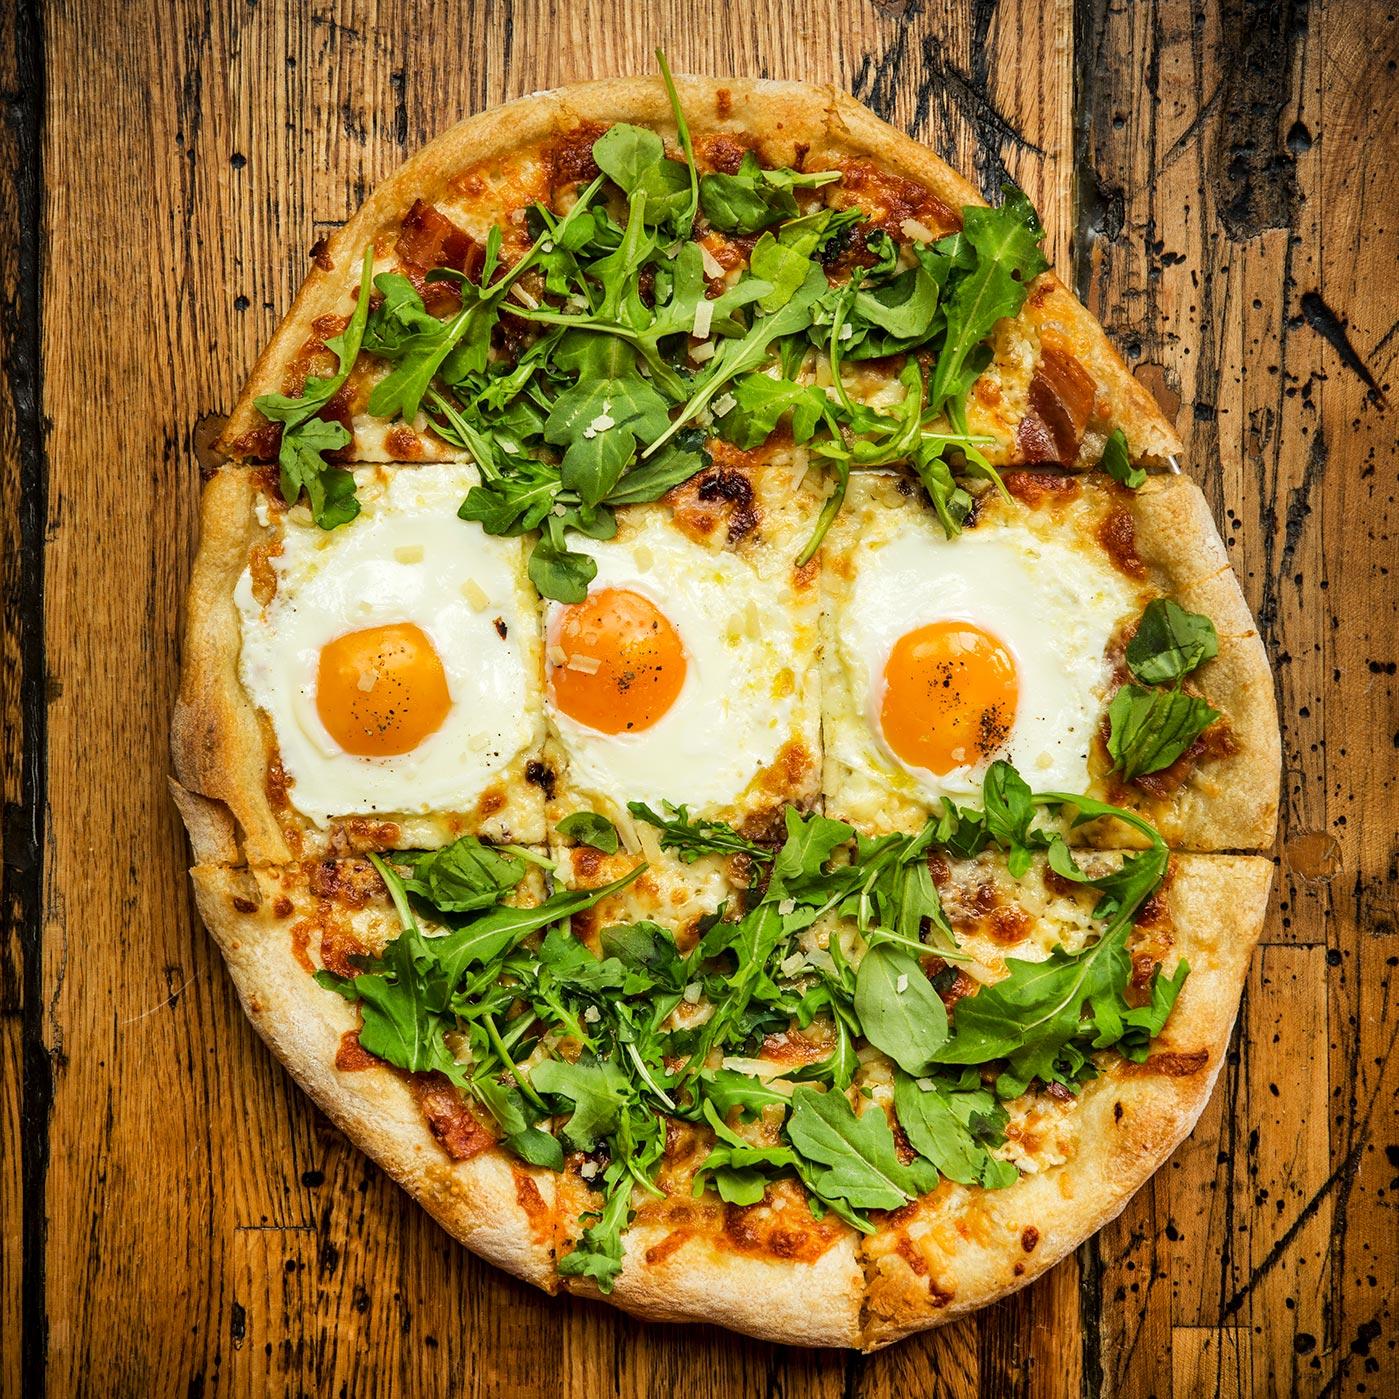 Pancetta w/ Eggs